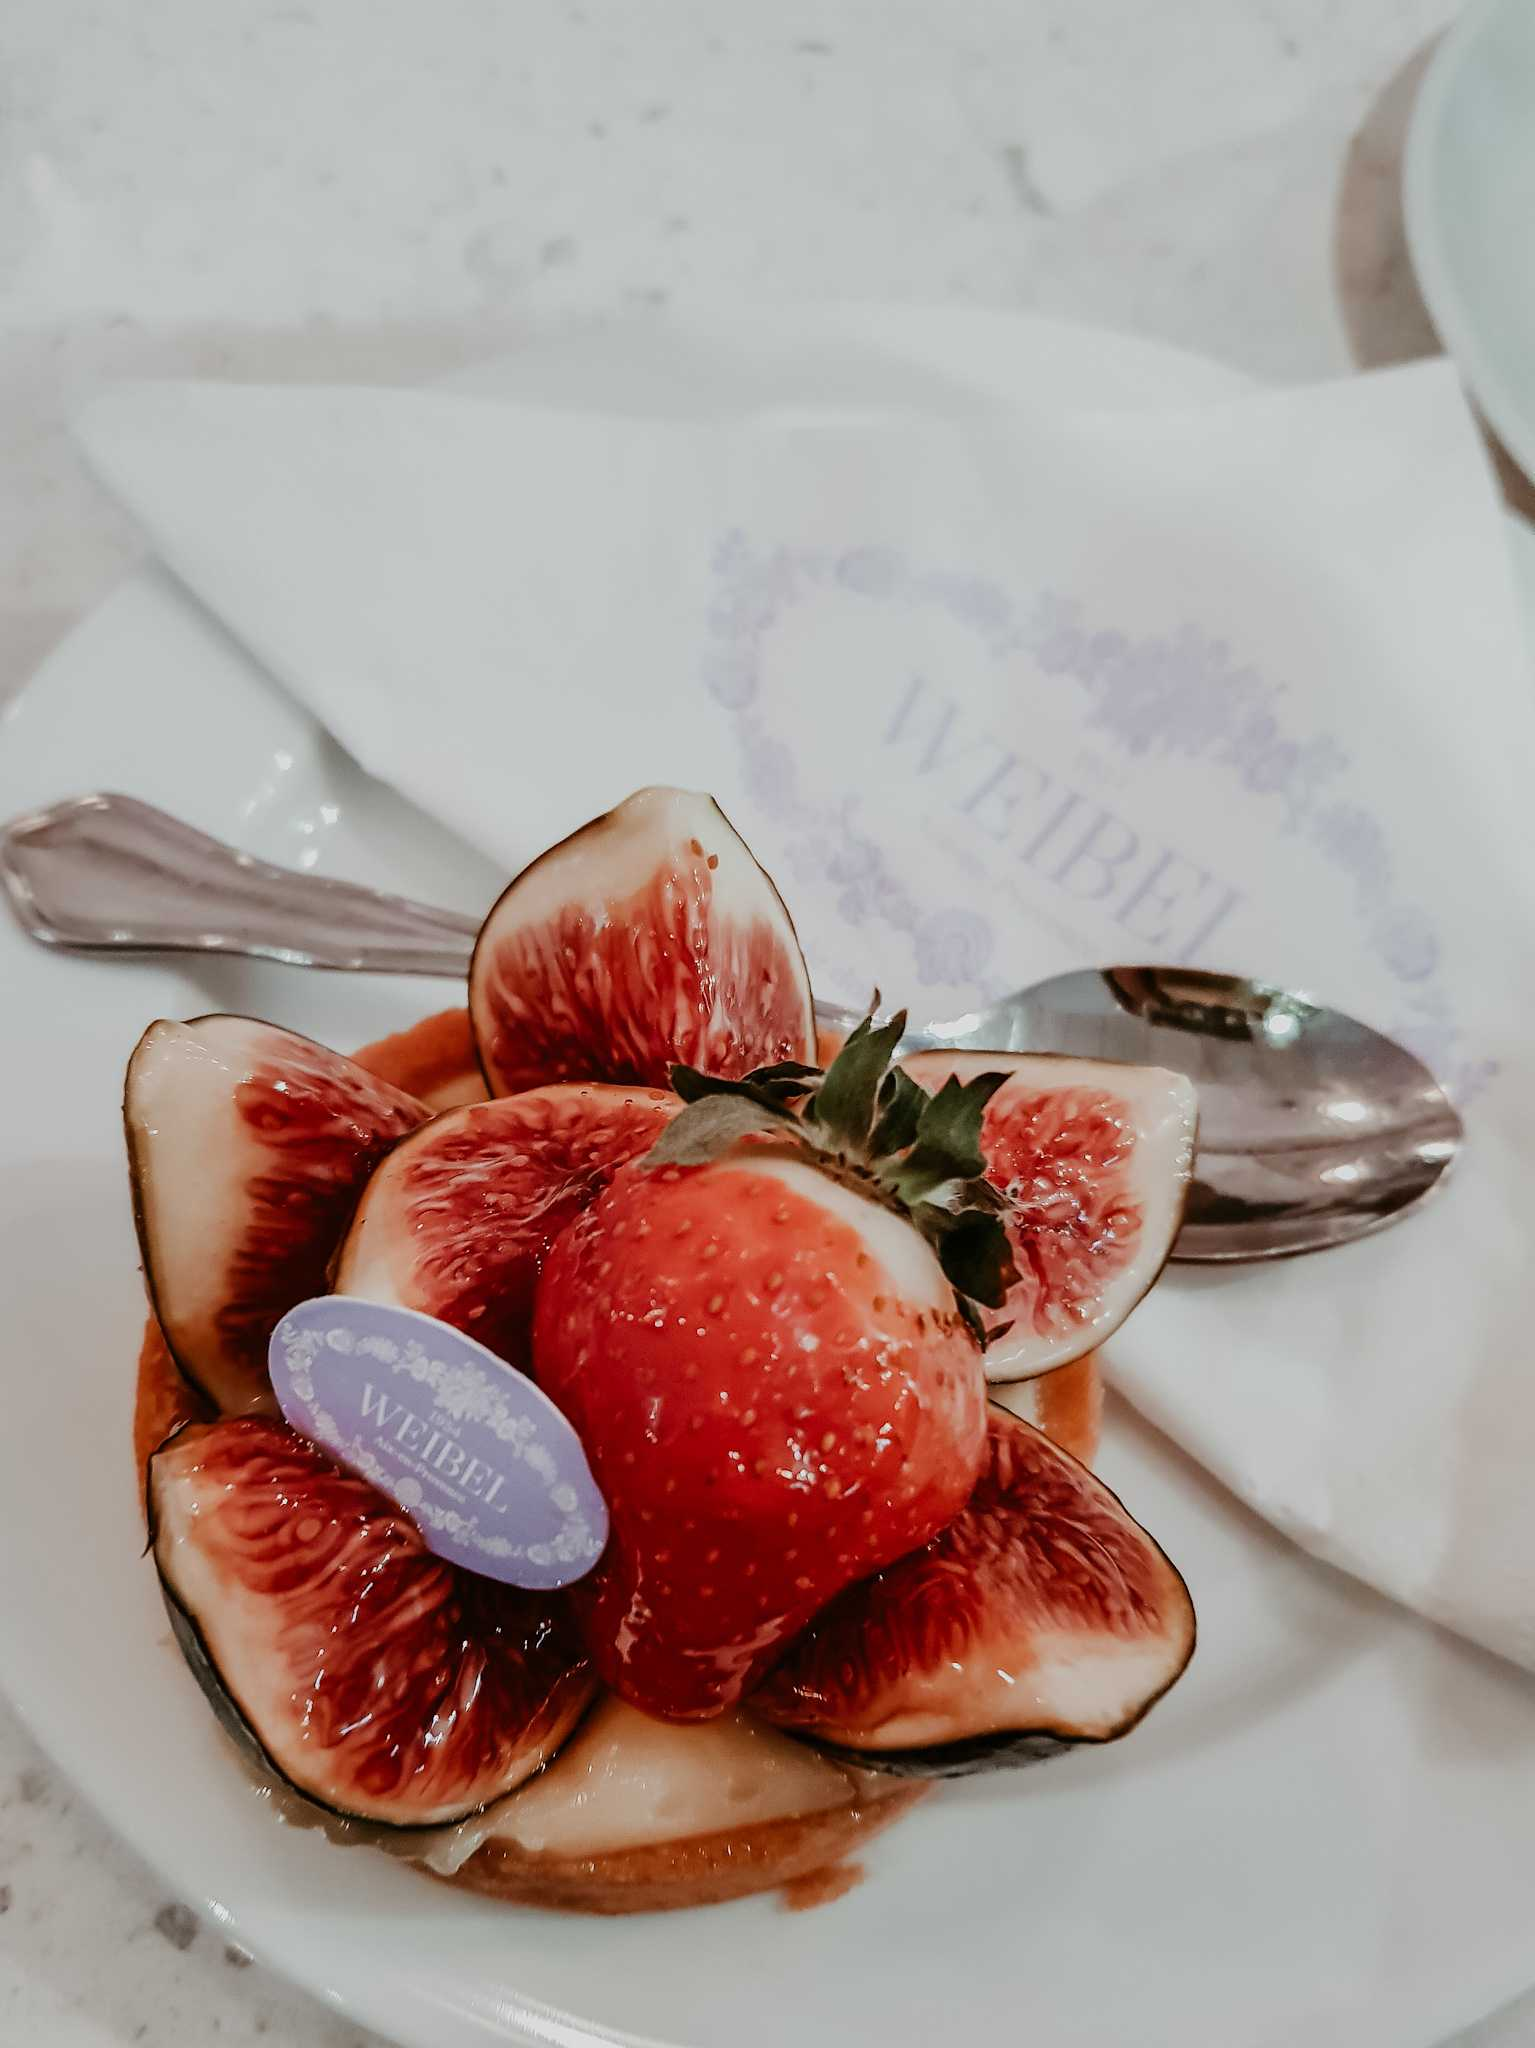 Aix en Provence Patisserie Weibel Törtchen mit Erdbeeren und Feigen